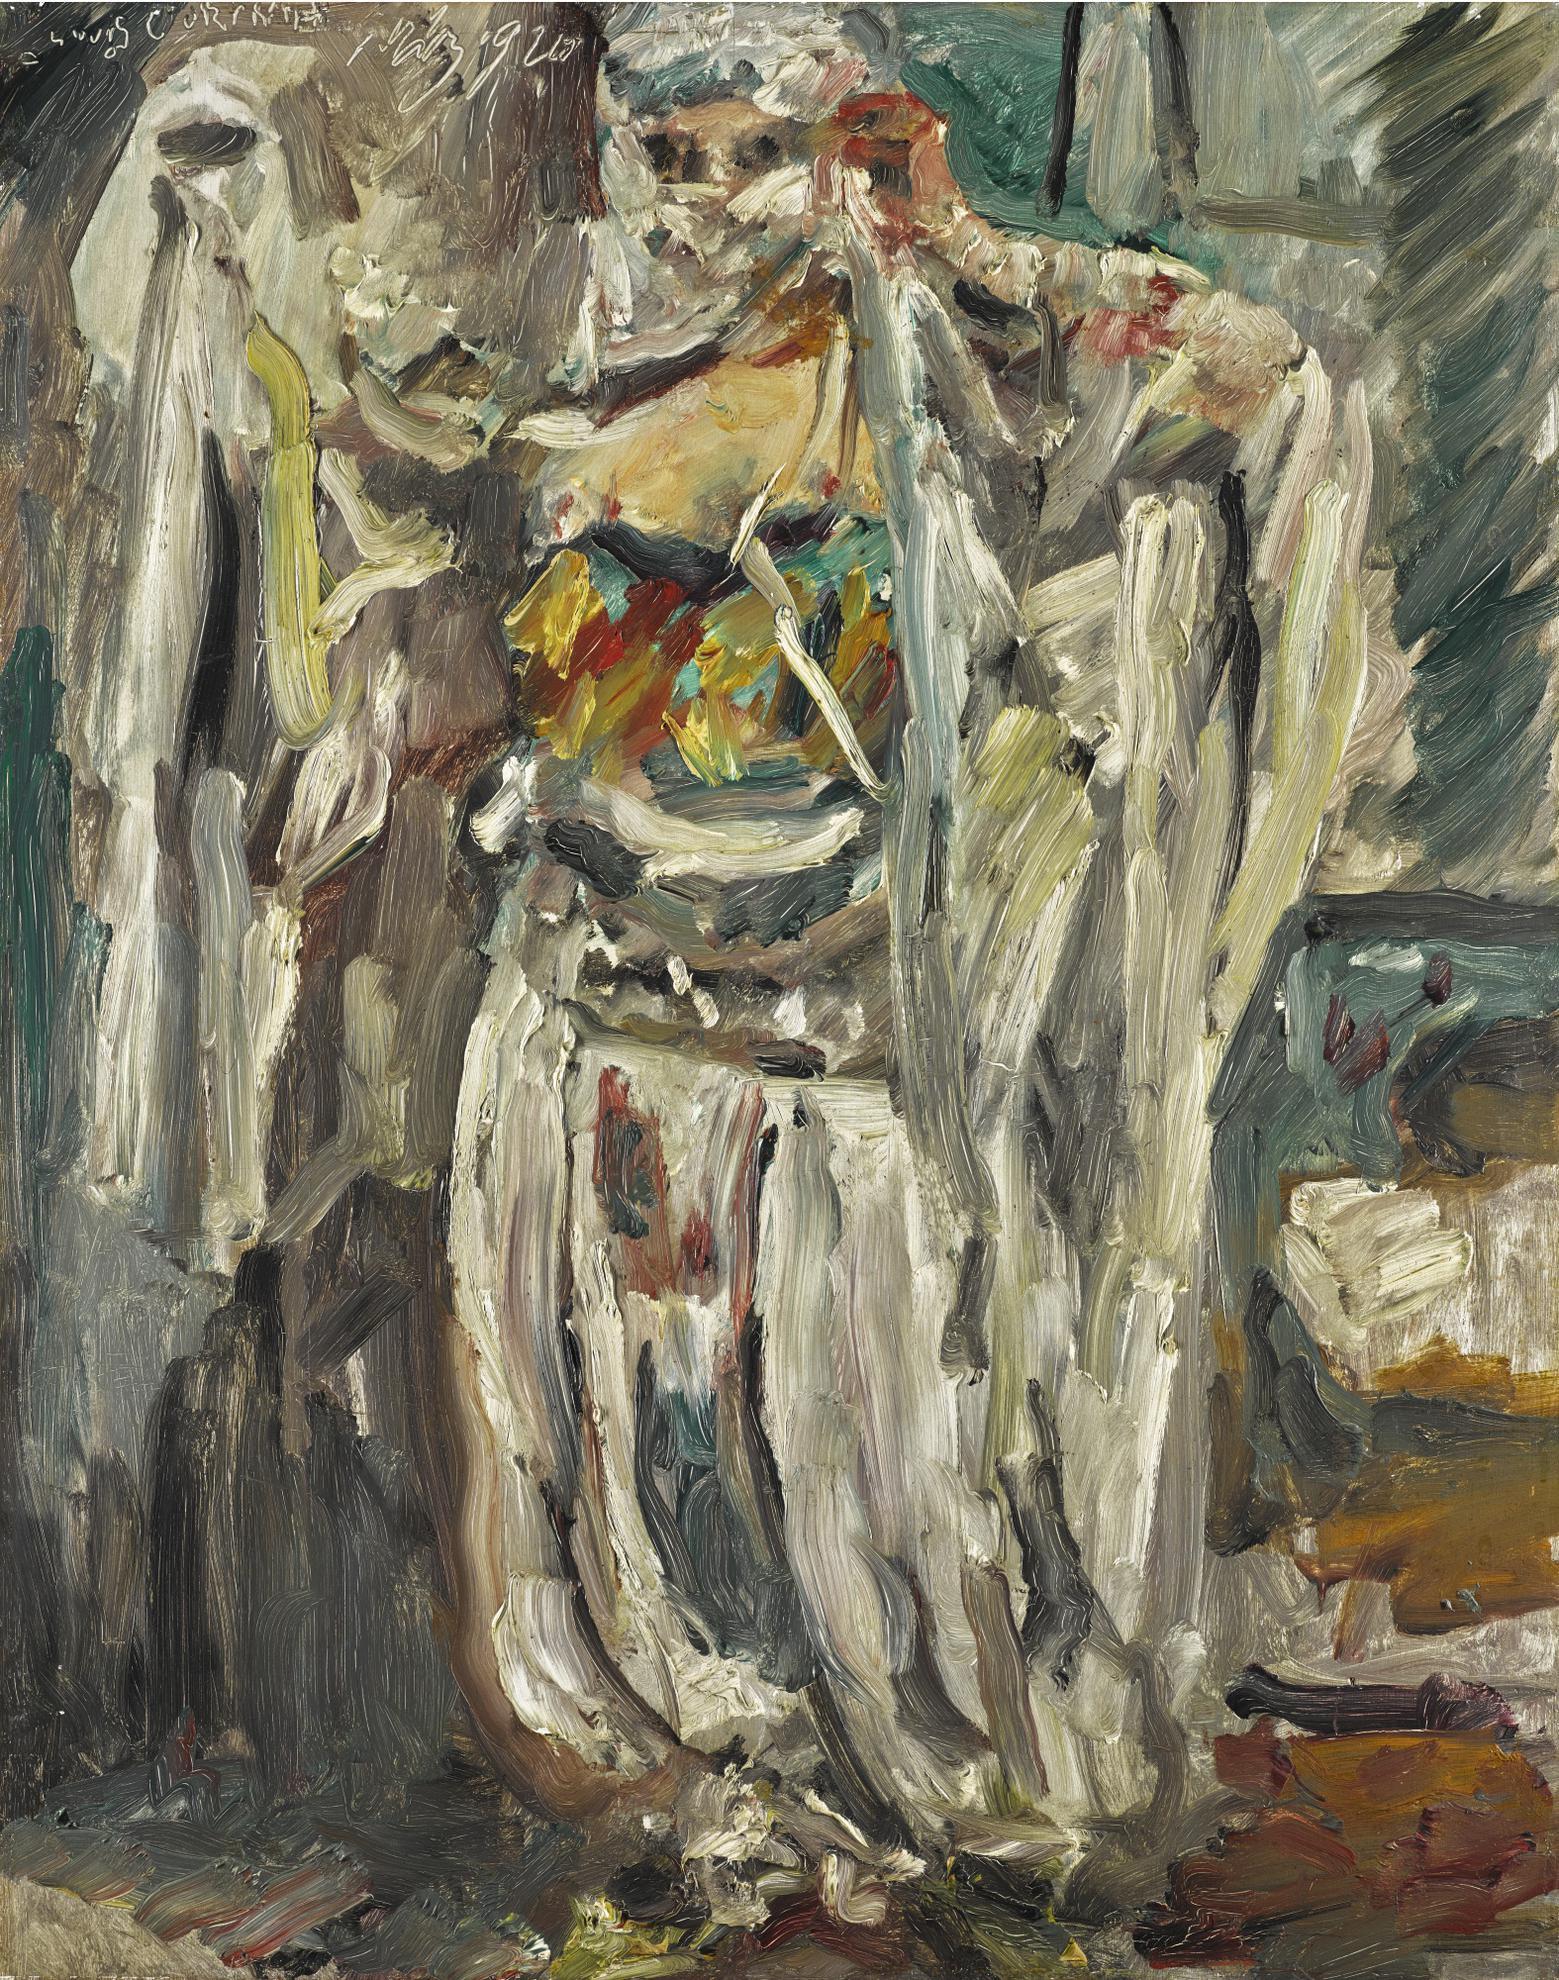 Lovis Corinth-Odaliske (Odalisque)-1920